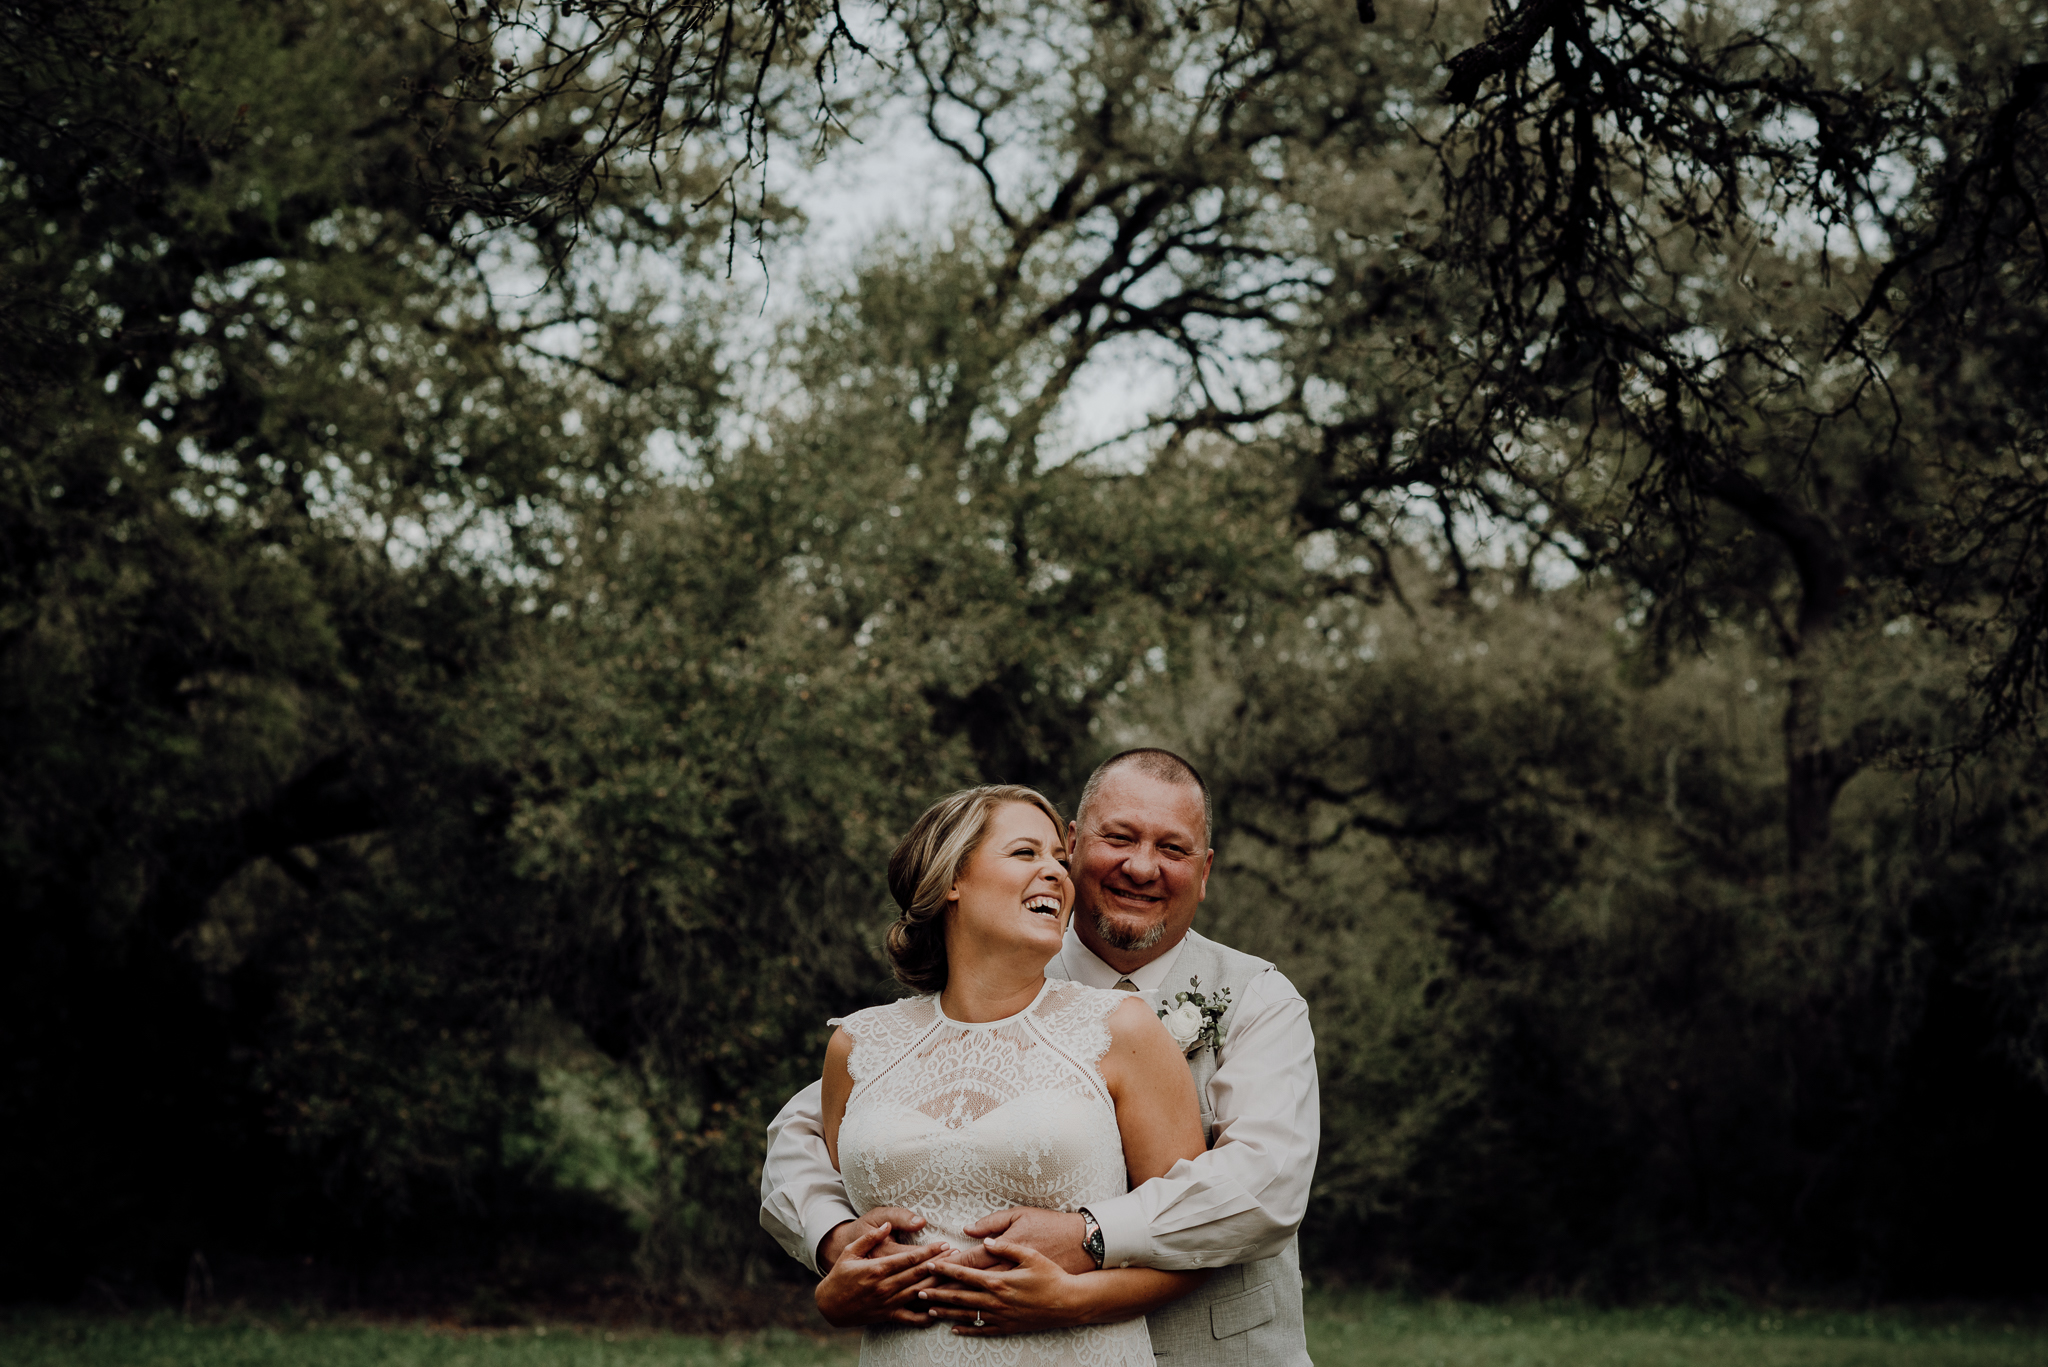 kristen giles photography | texas-wedding-elopement-photographer-Duchman Winery-Austin TX-23-blog.jpg